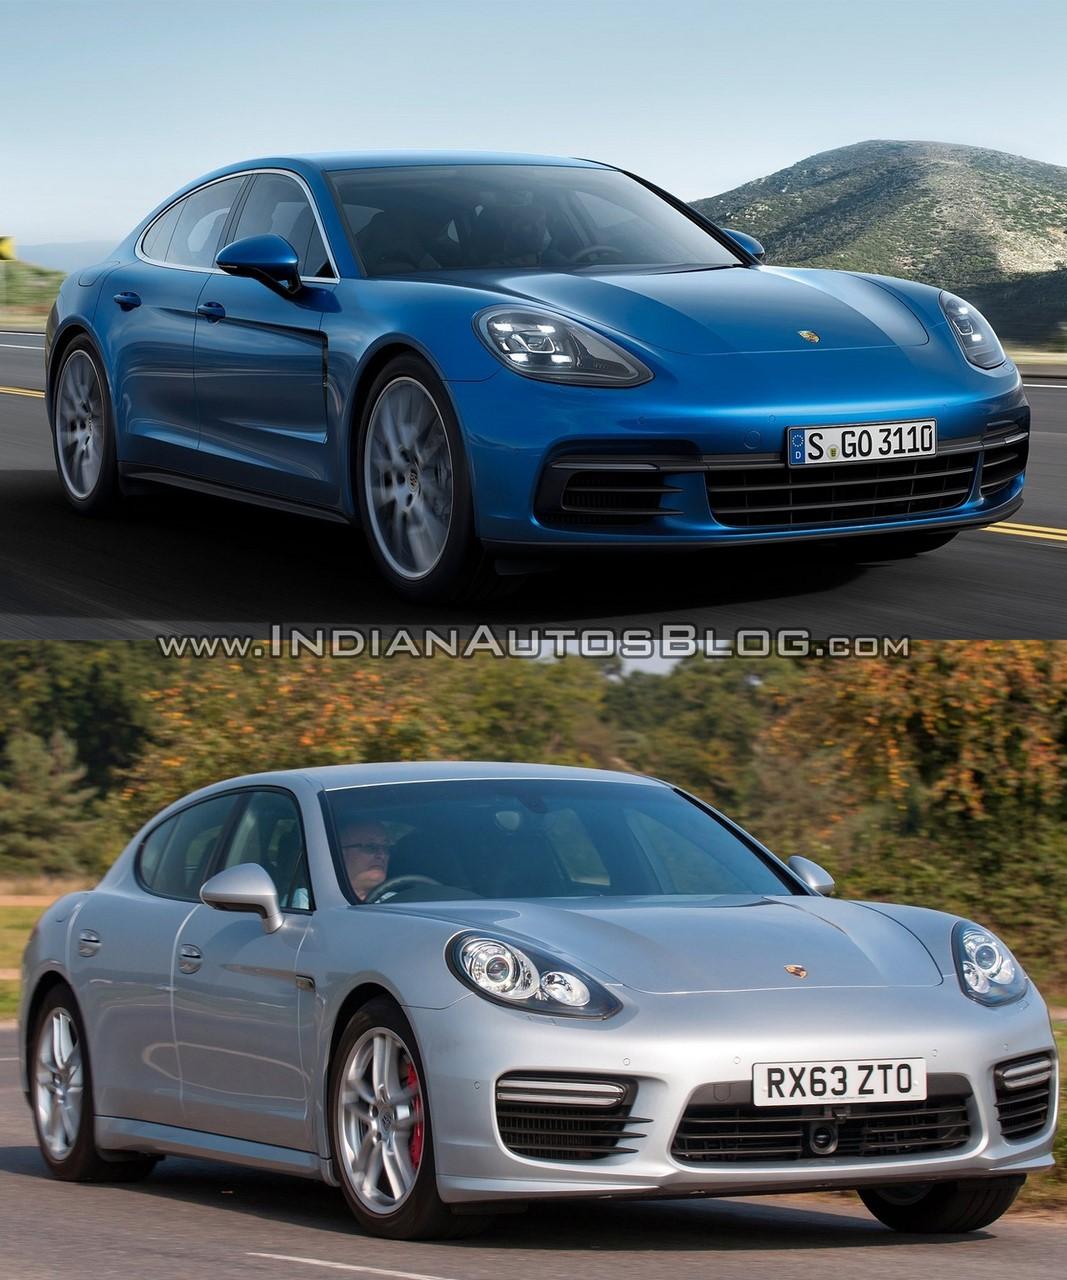 2017 Porsche Panamera vs. 2014 Porsche Panamera front three quarters right side